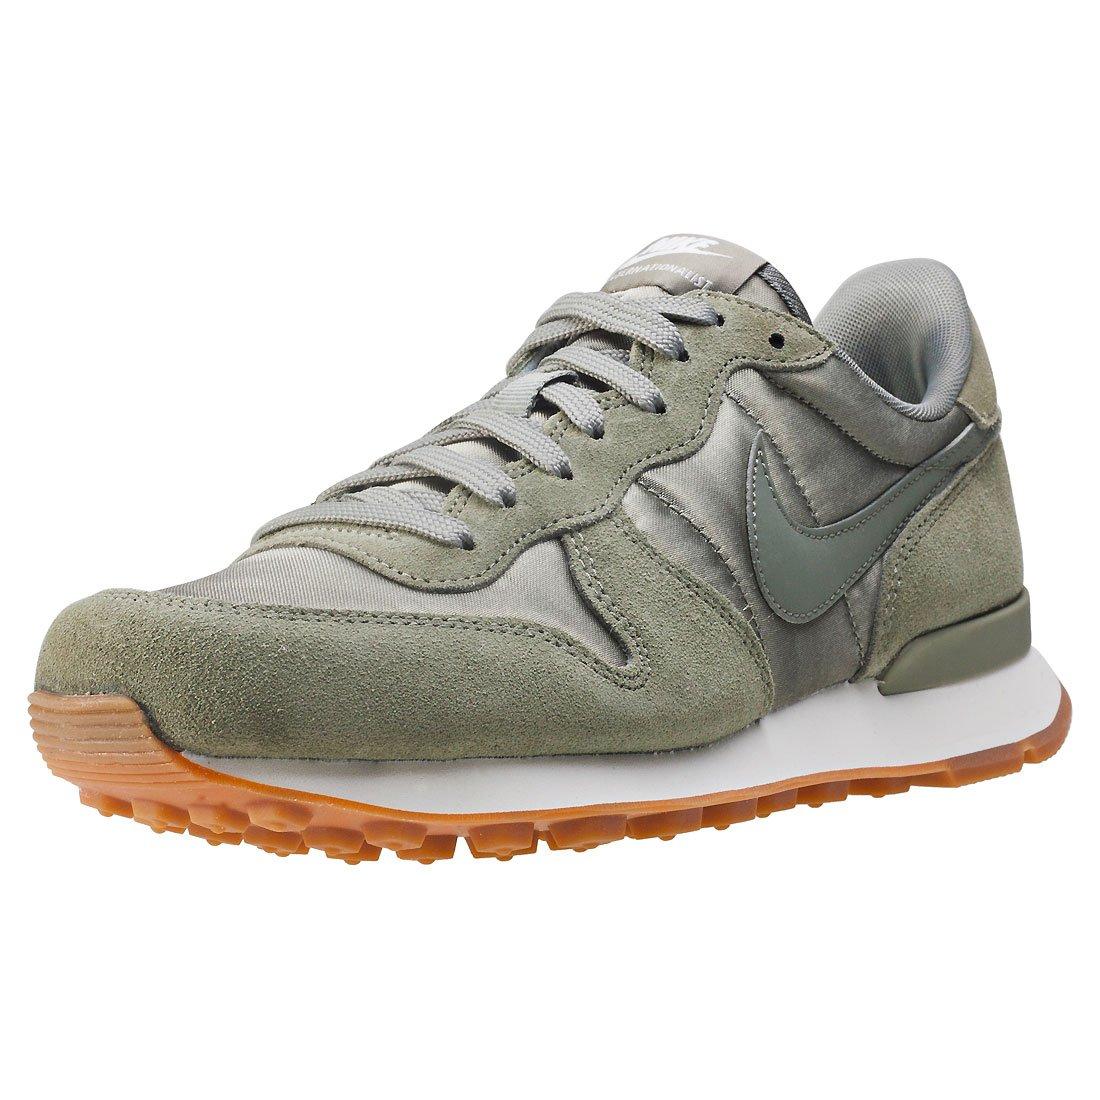 Nike Internationalist Womens Trainers Khaki - 4 UK: Amazon.co.uk ...